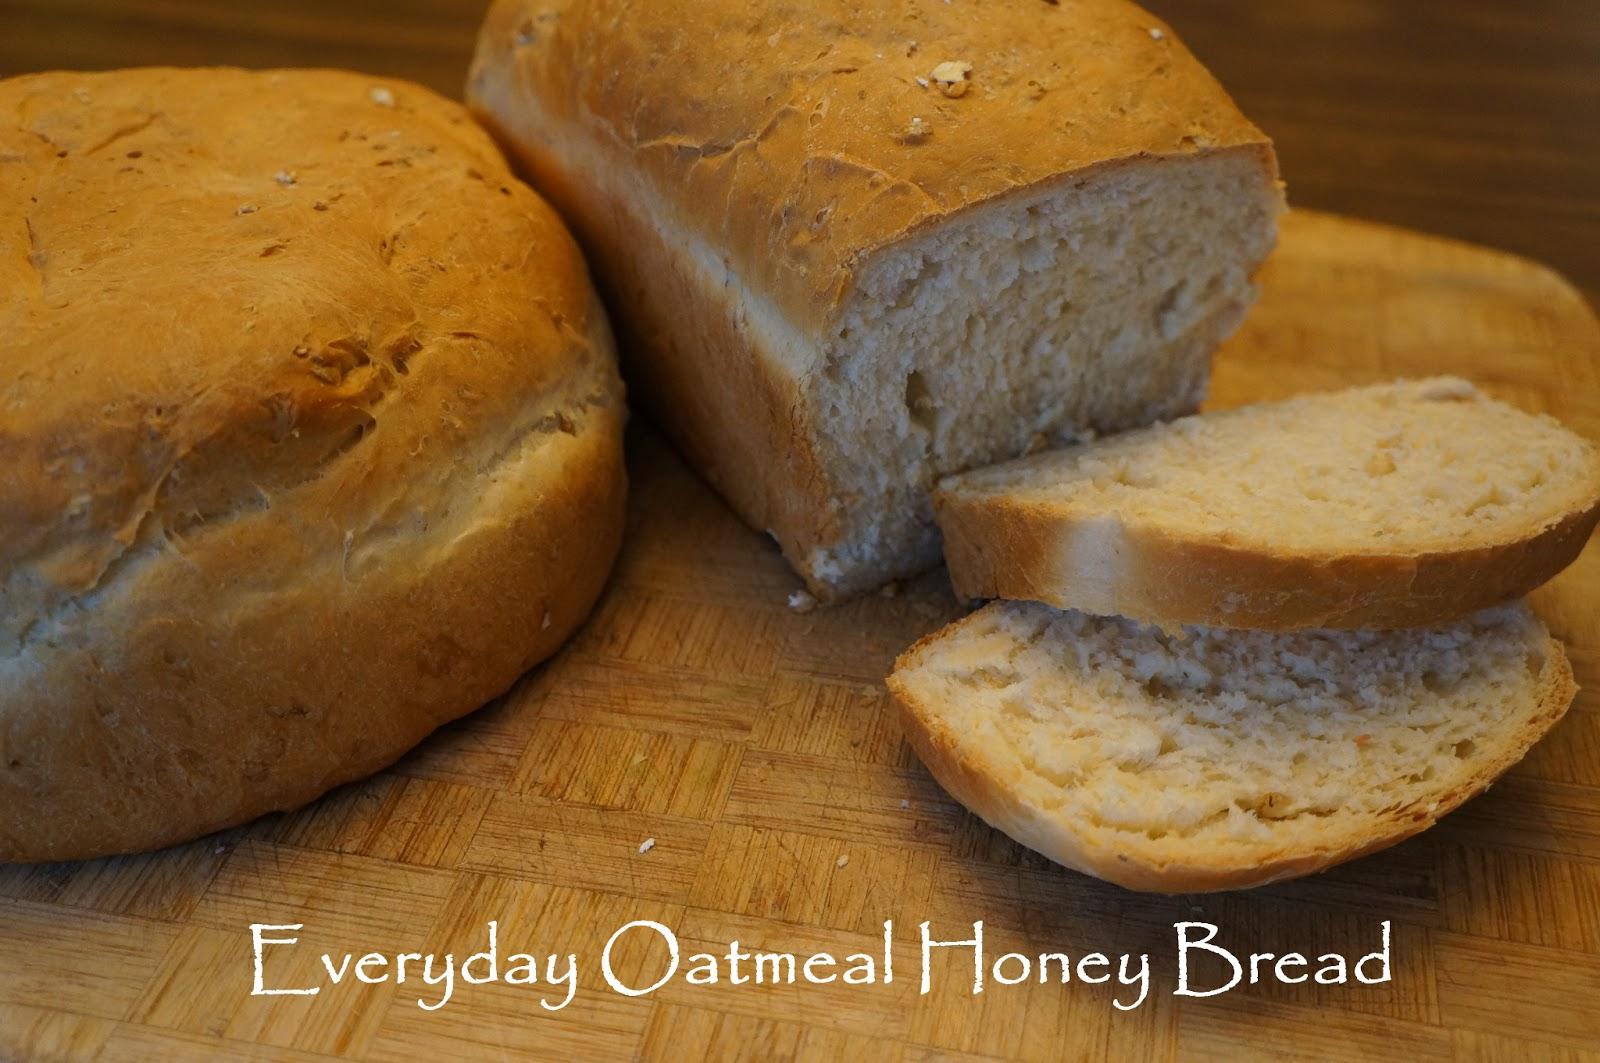 The Backyard Farming Connection: Everyday Oatmeal Honey Bread